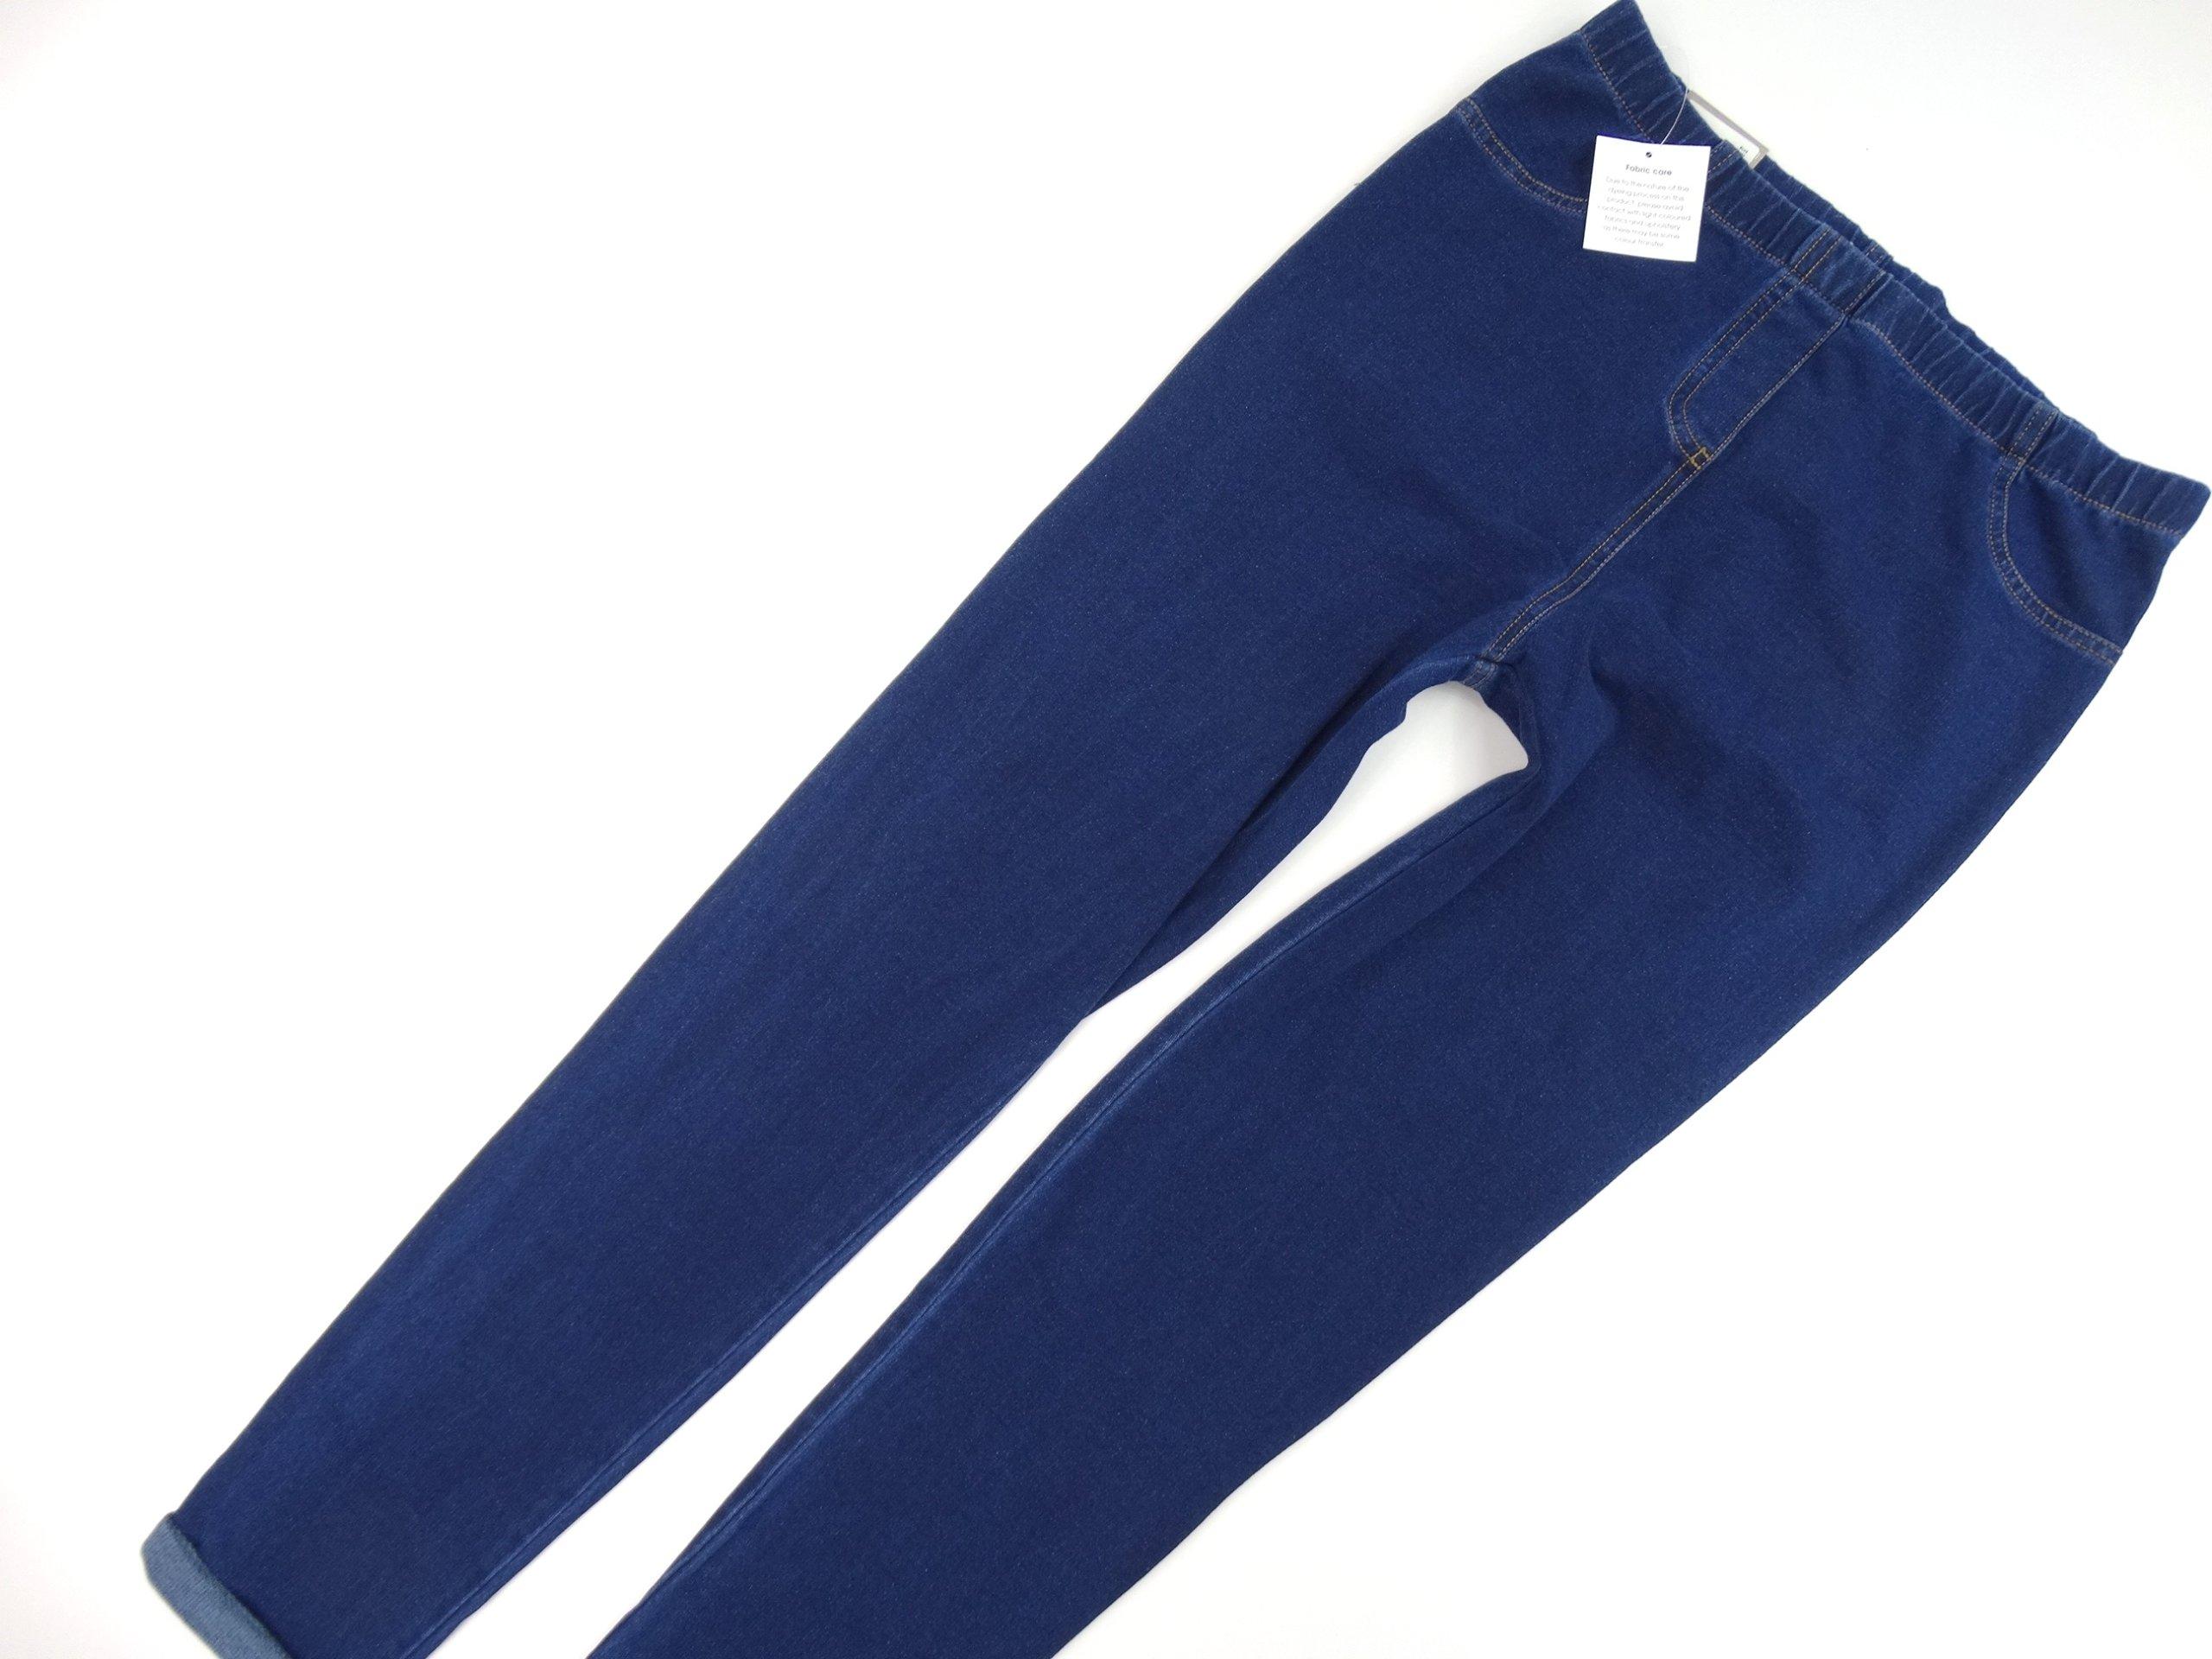 7cfd834e18 TU J510 spodnie damskie TREGGINSY 40 NOWE - 7199649029 - oficjalne ...